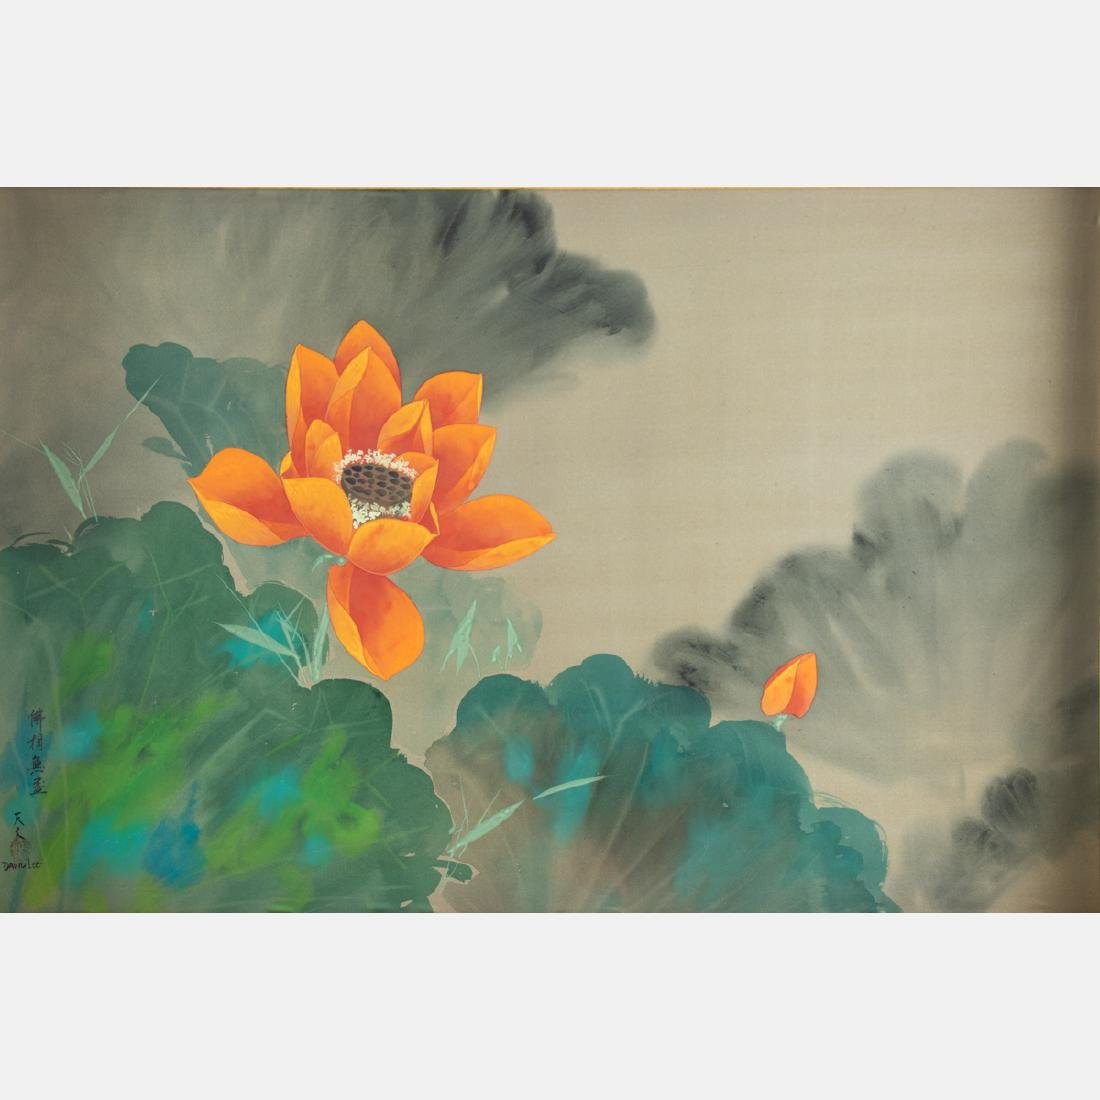 David Lee (Chinese, b. 1944) Orange Blossom, Oil on